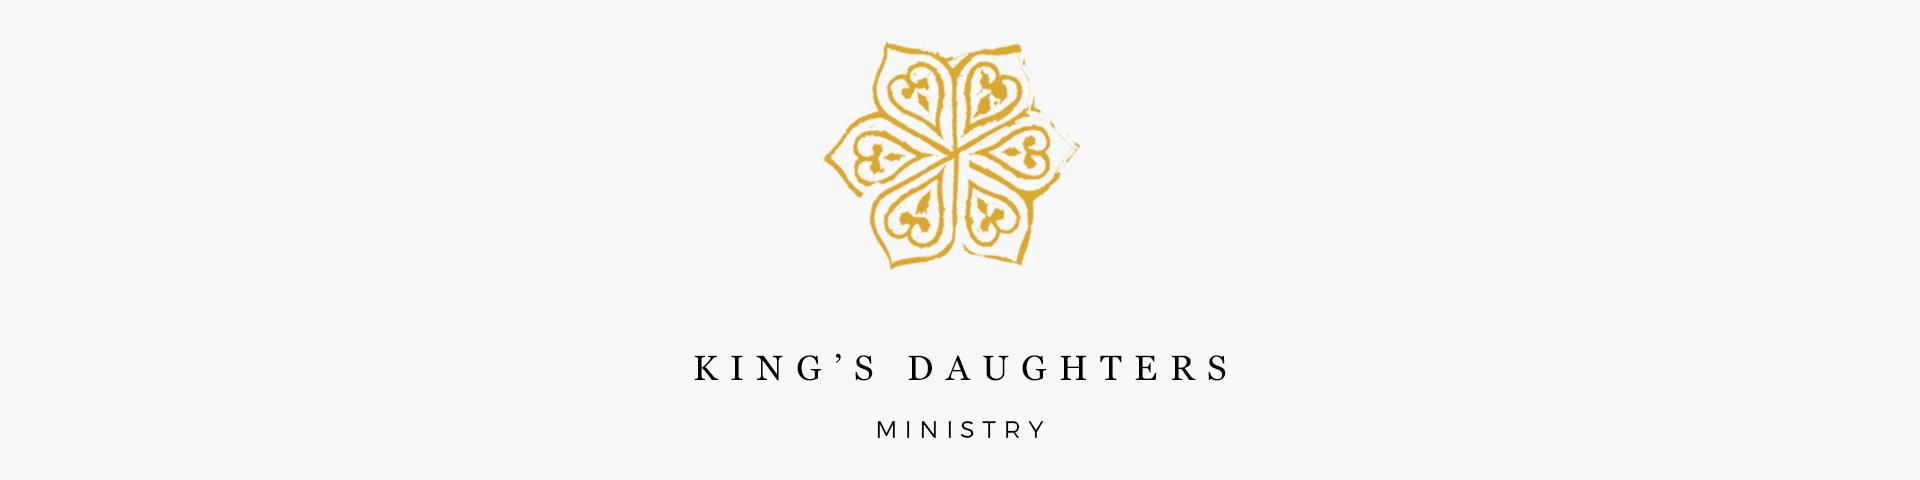 kings main logo.jpg